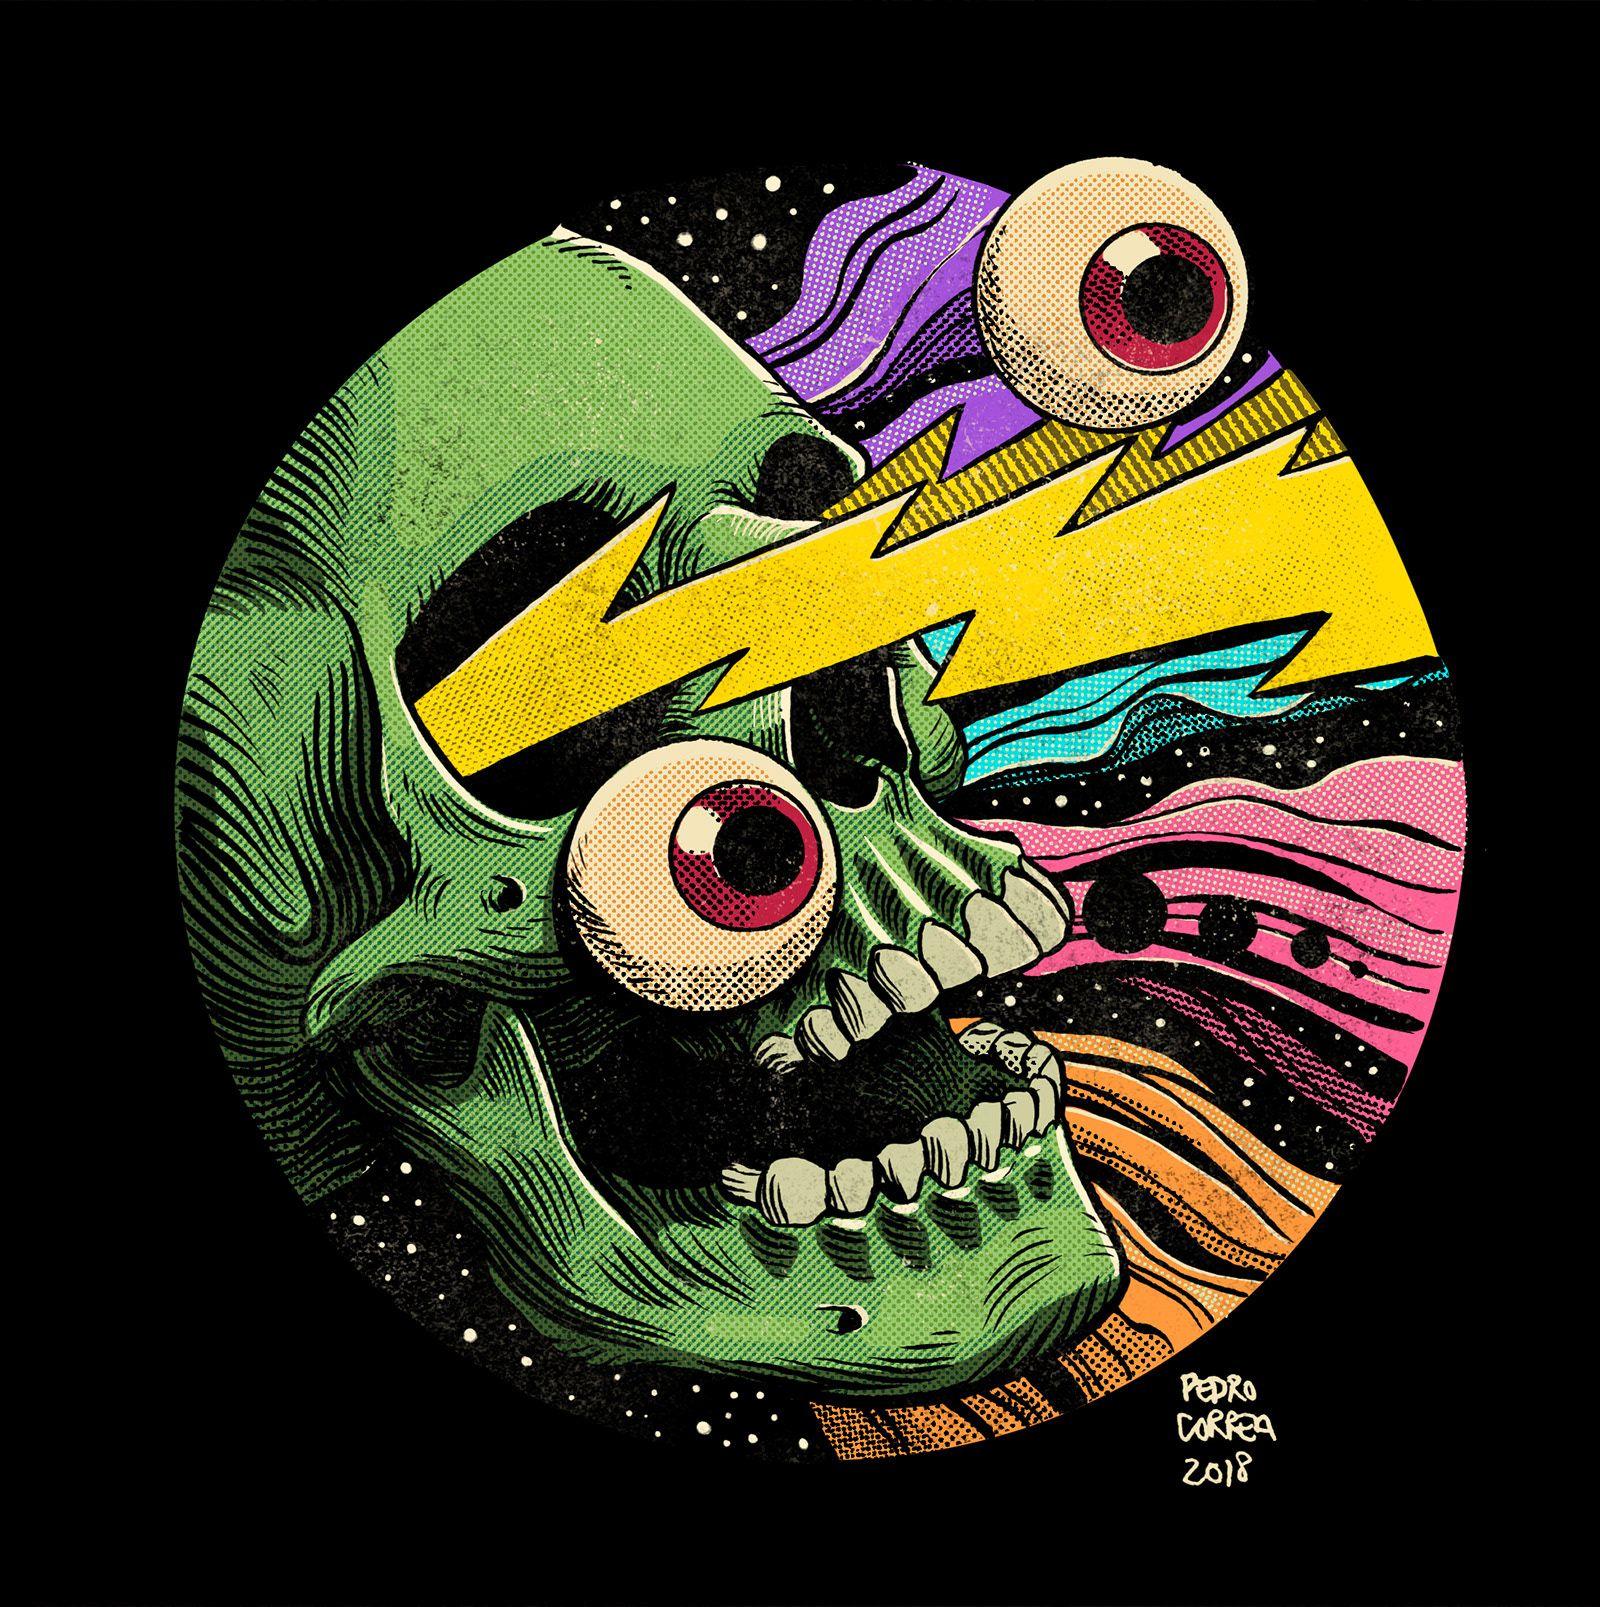 Pedro Correa Illustrator - Cosmic Eyeballs Pedro C